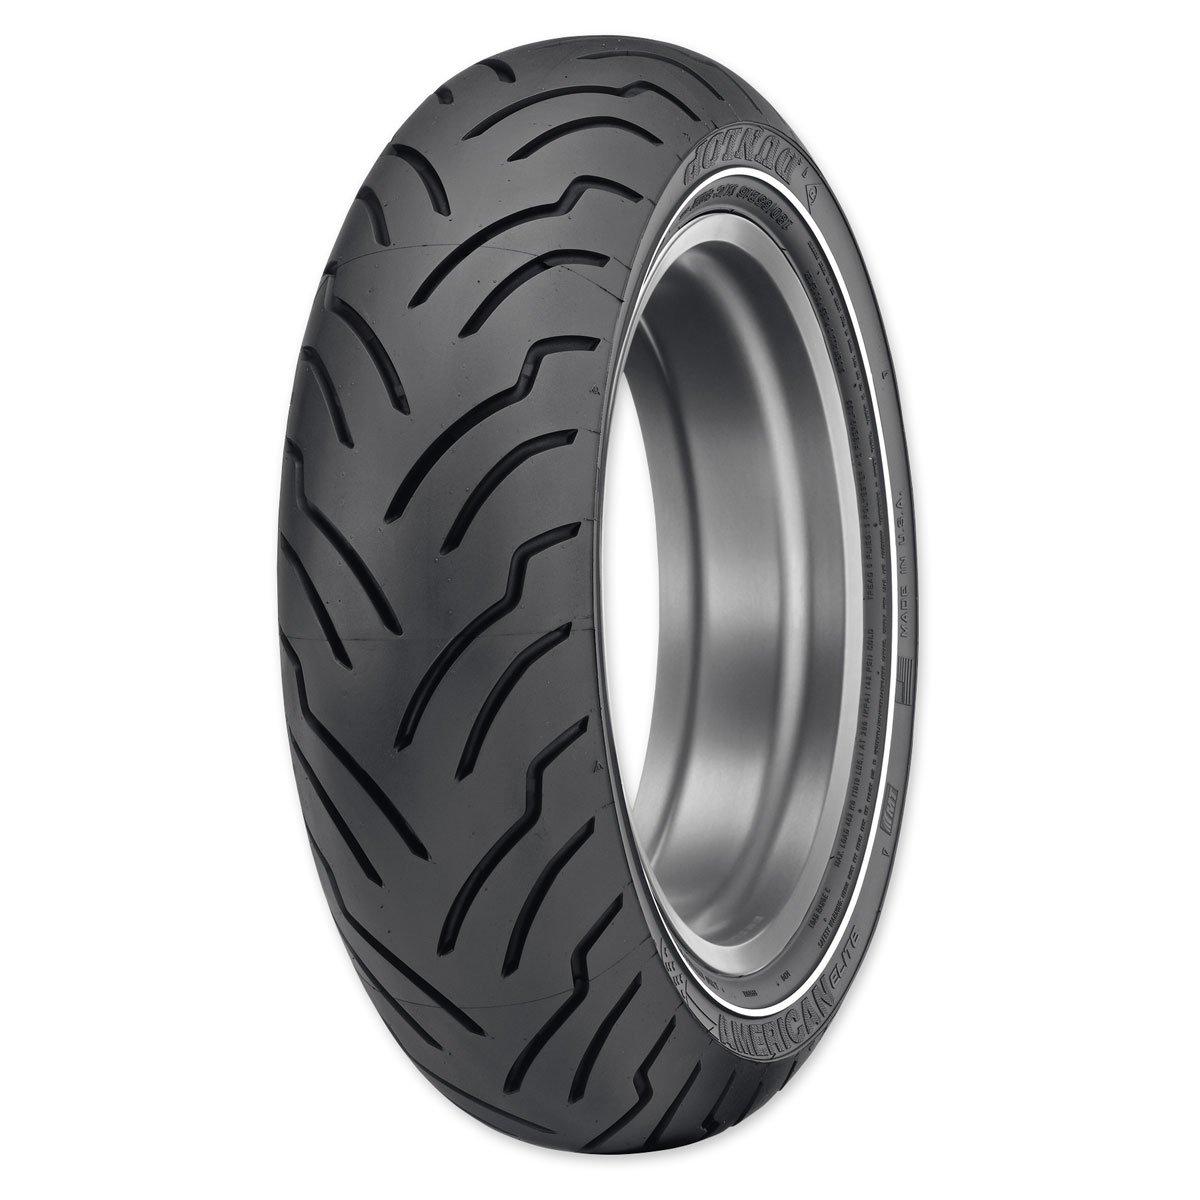 Dunlop American Elite MU85B16 Narrow Whitewall Rear Tire 32AE-23